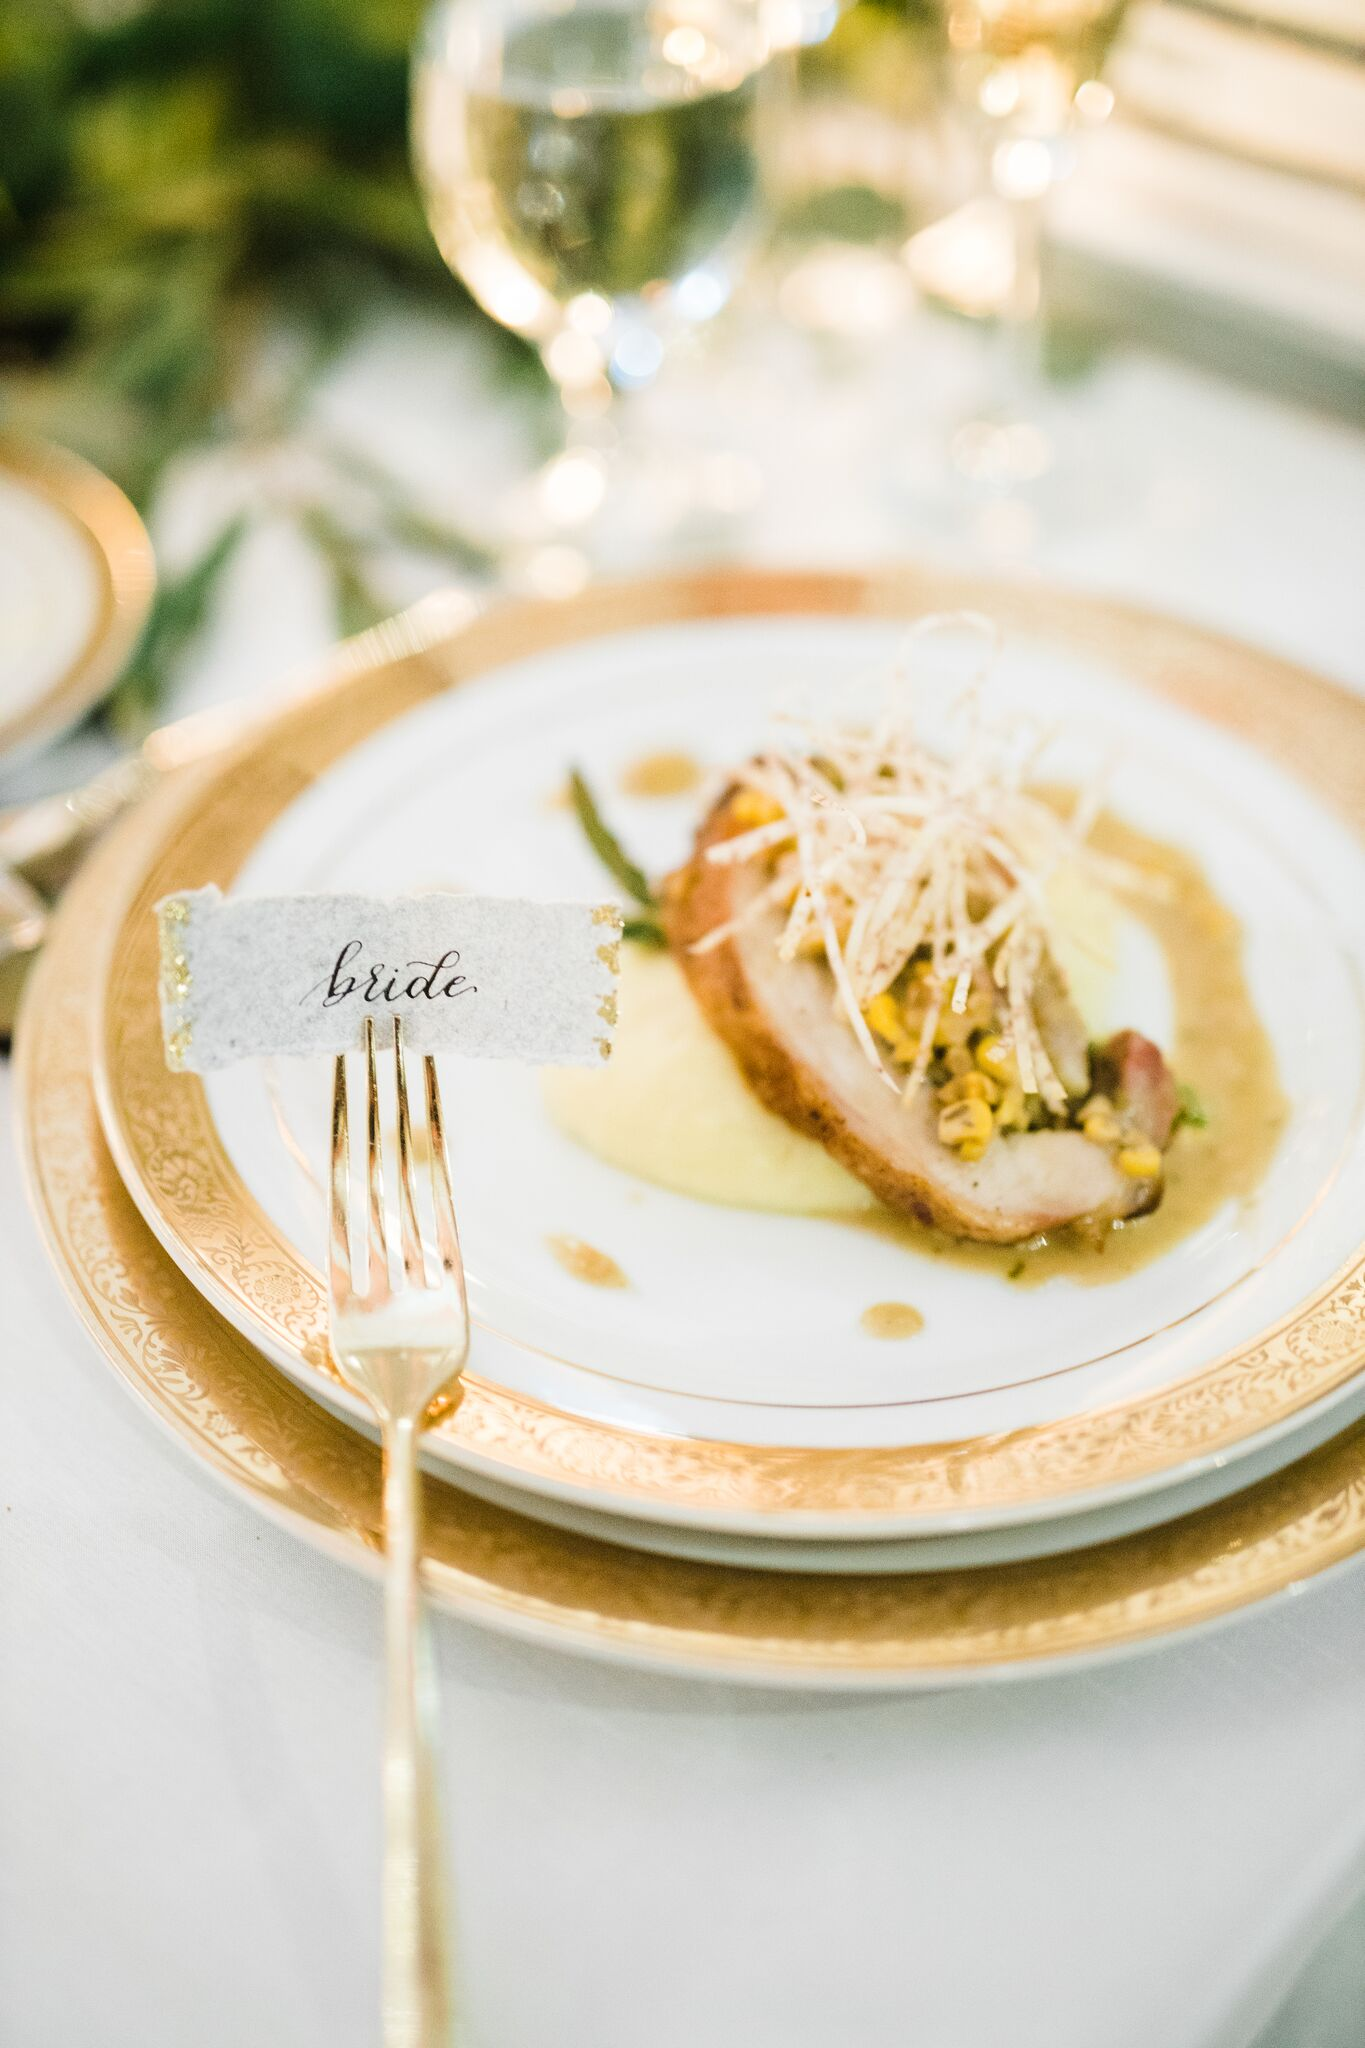 Wedding dinner plate